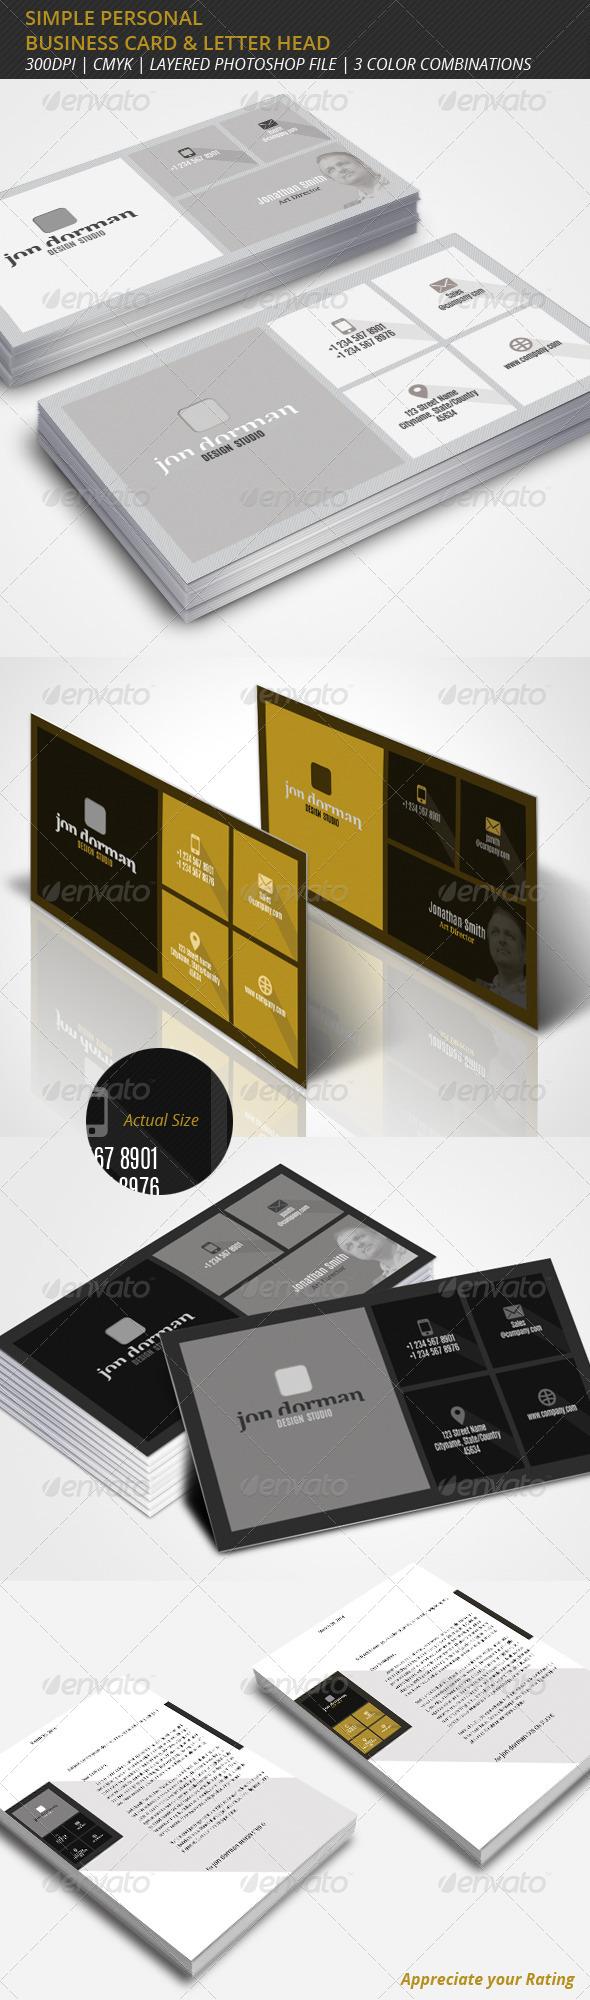 GraphicRiver Simple Professional Business Card & Letterhead 6949825